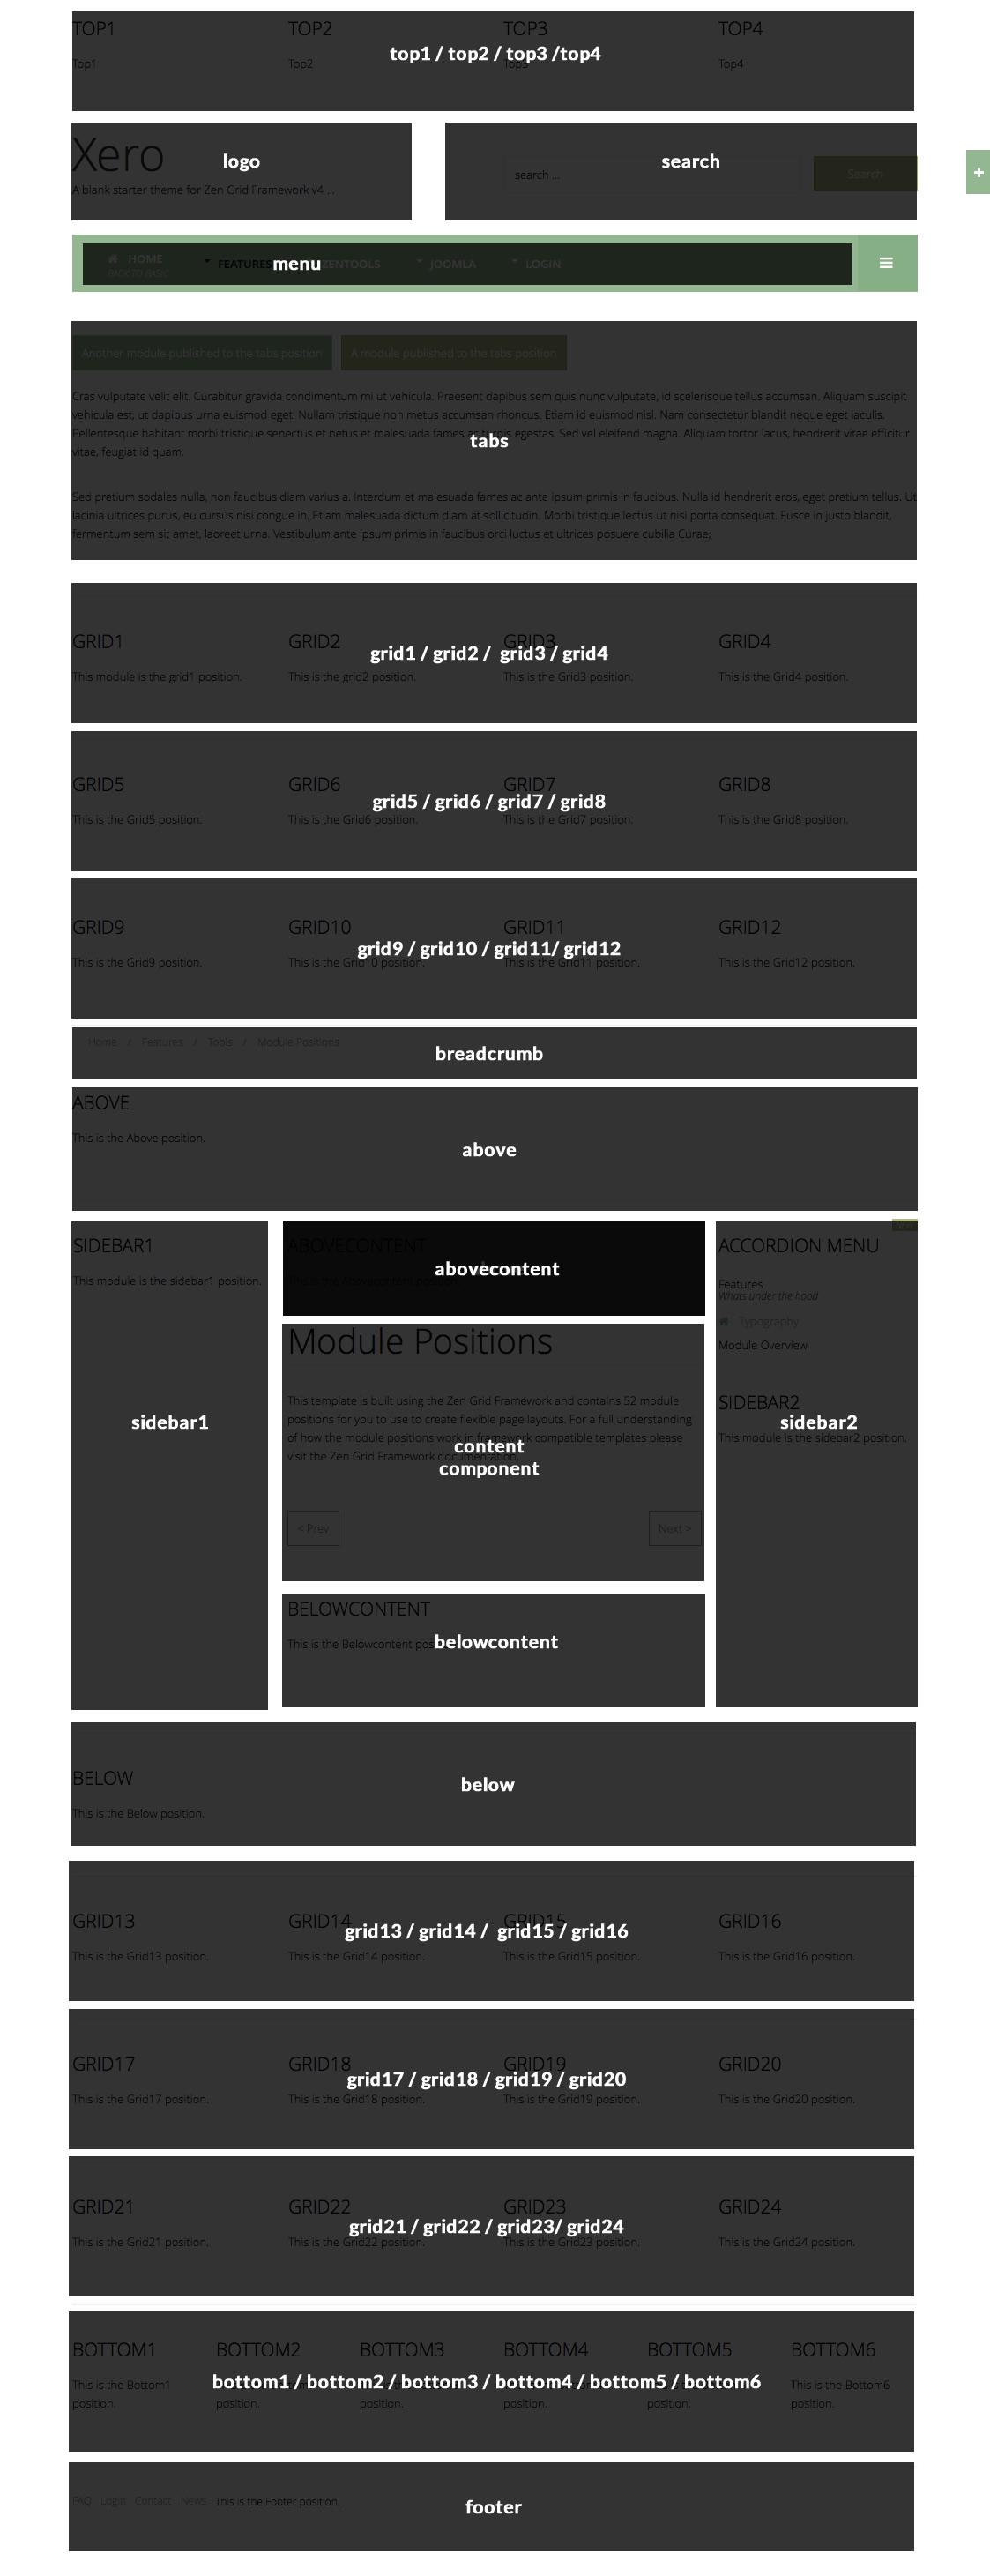 xero Module Positions